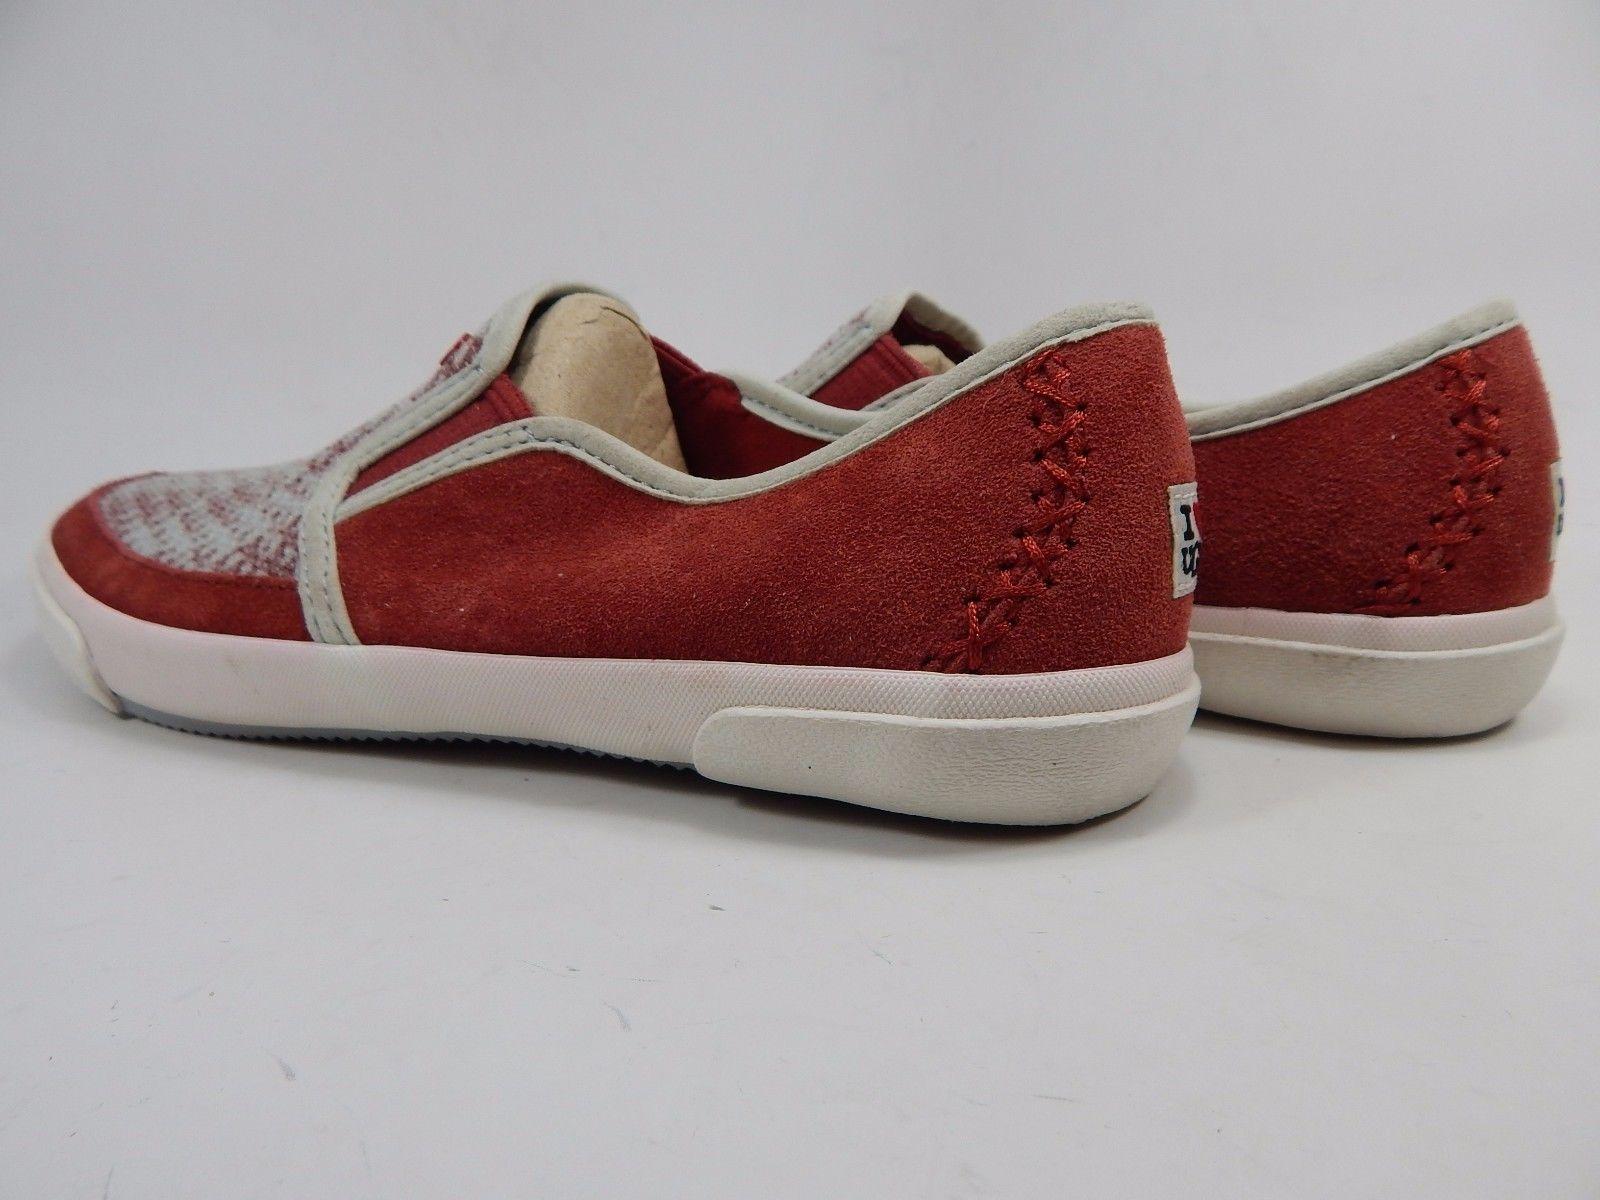 UGG Australia I Heart Slip On Sequin Plaid Slippers Flats Size 7 M Red  1009999